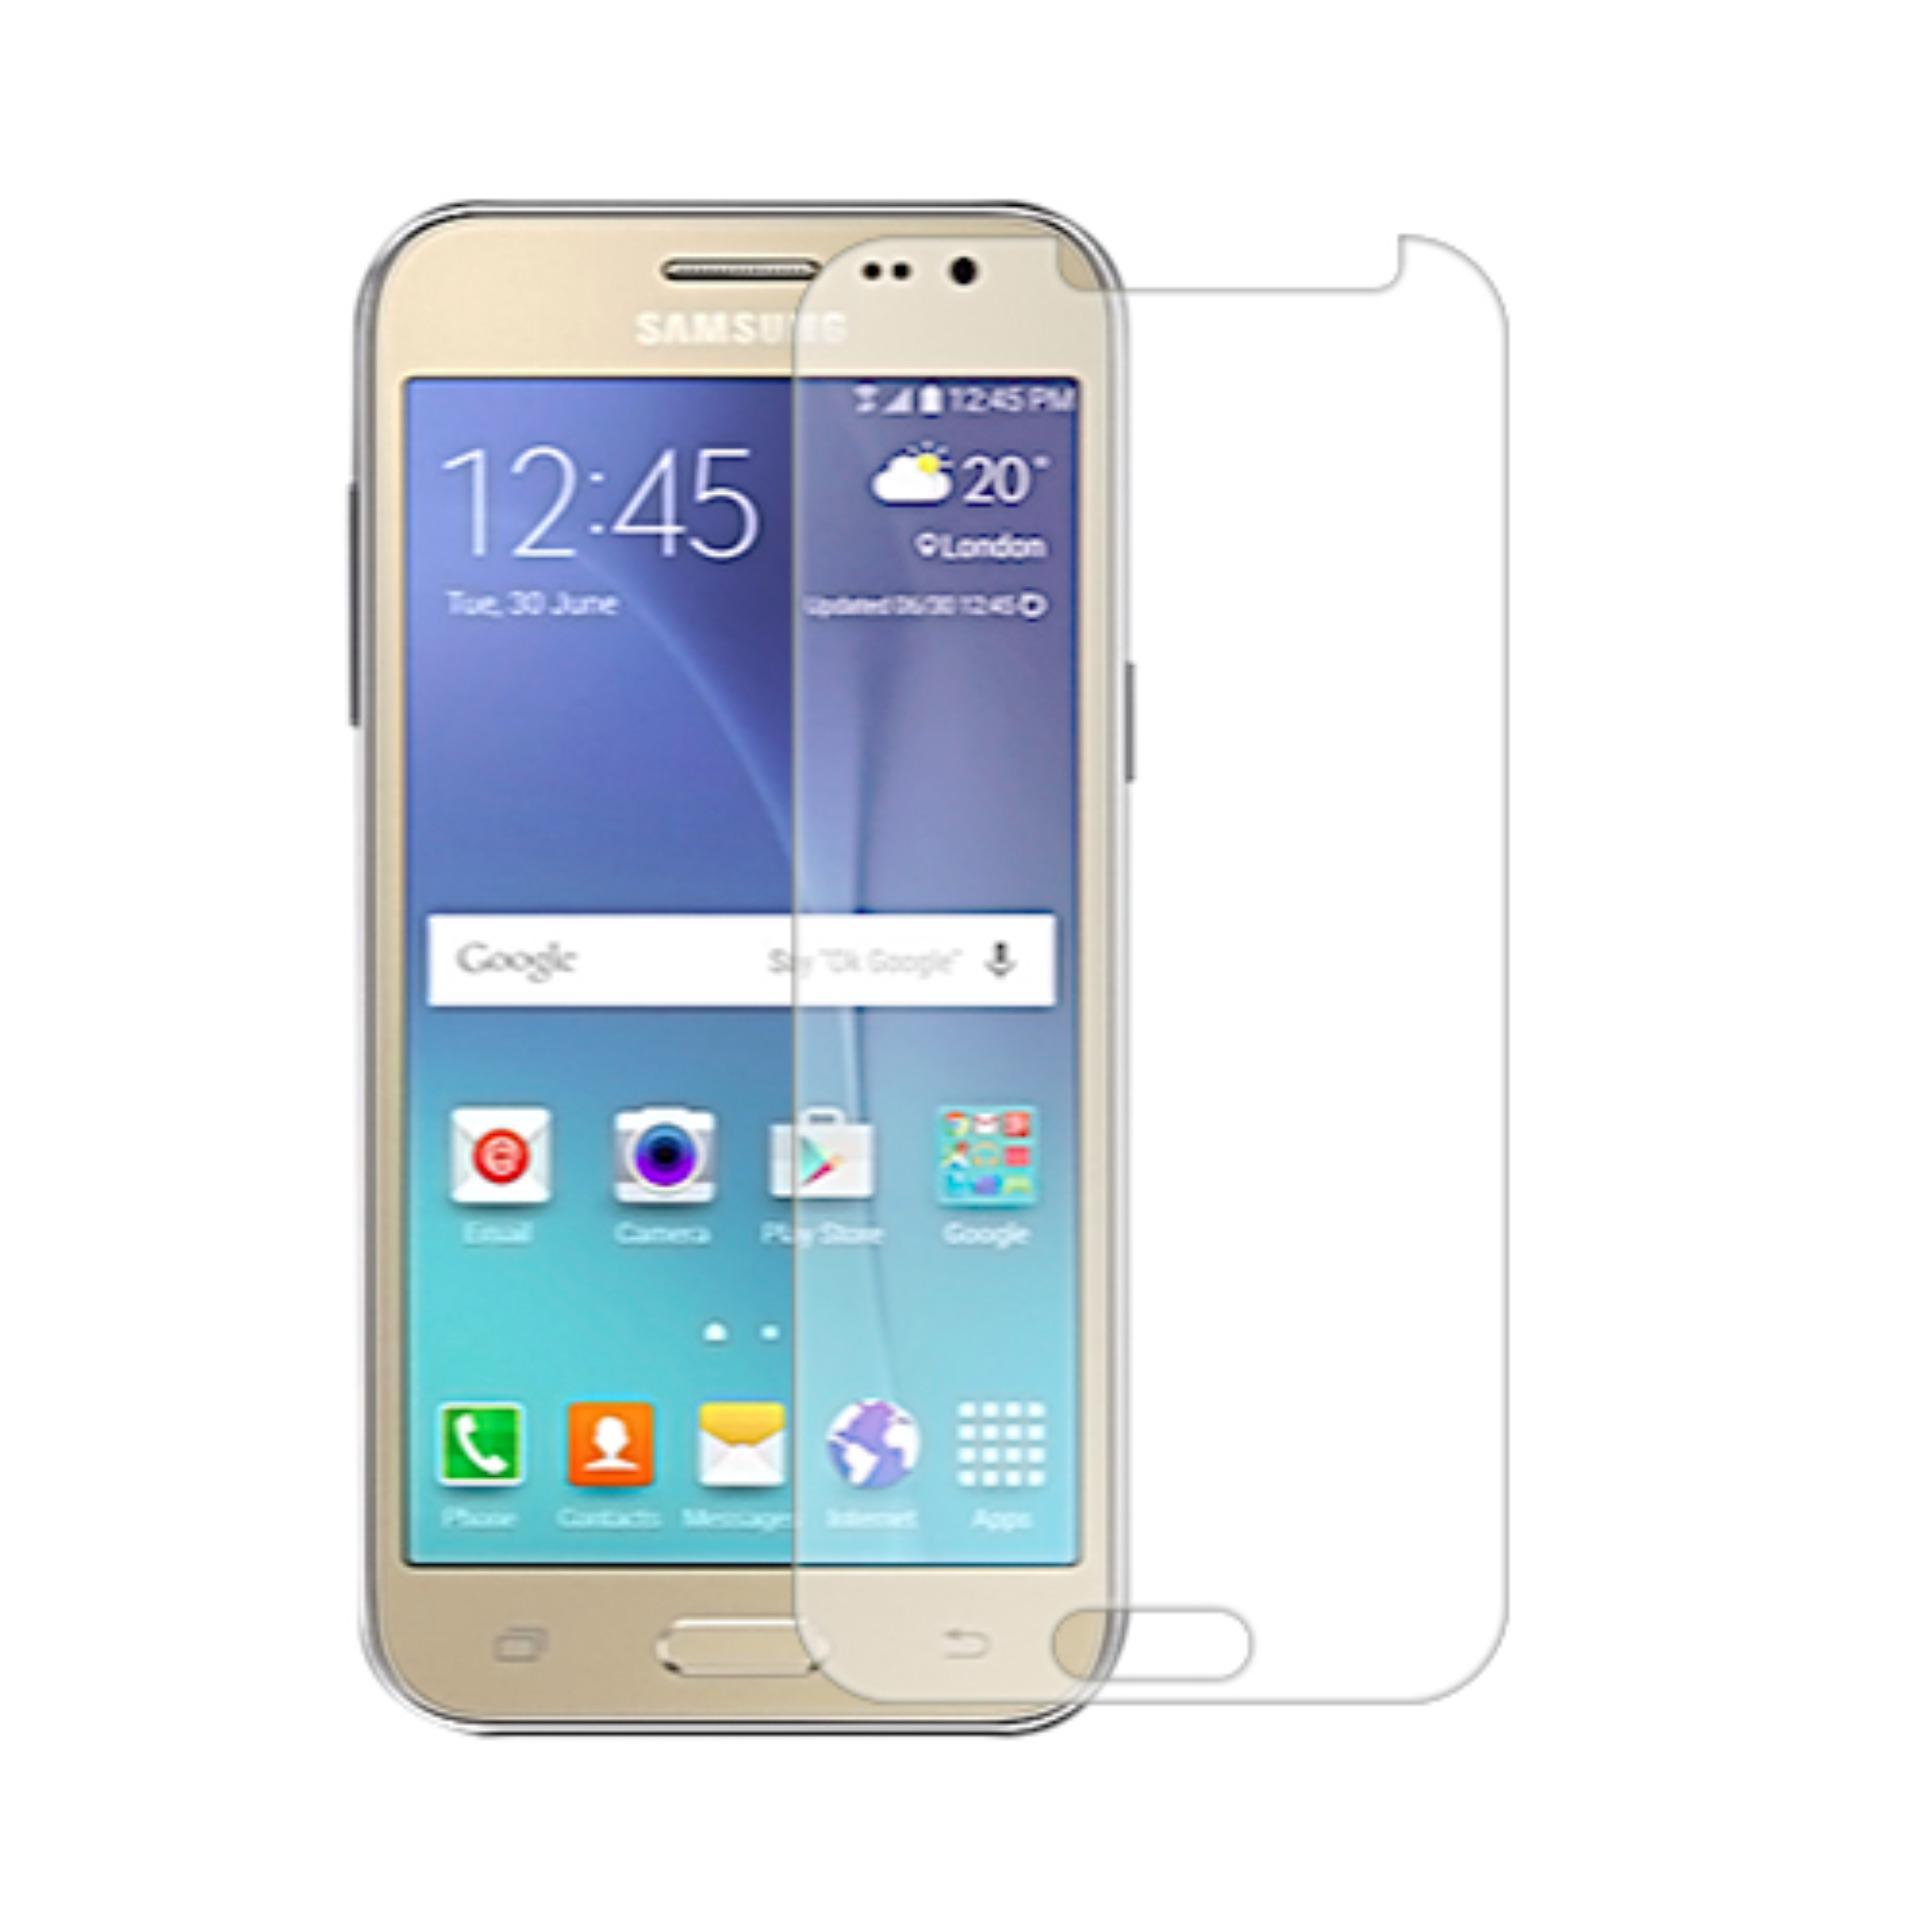 Samsung Galaxy Grand 1 Neo Plus Duos I9080 I9082 I9060 Tempered Source Blackberry Q10 Glass